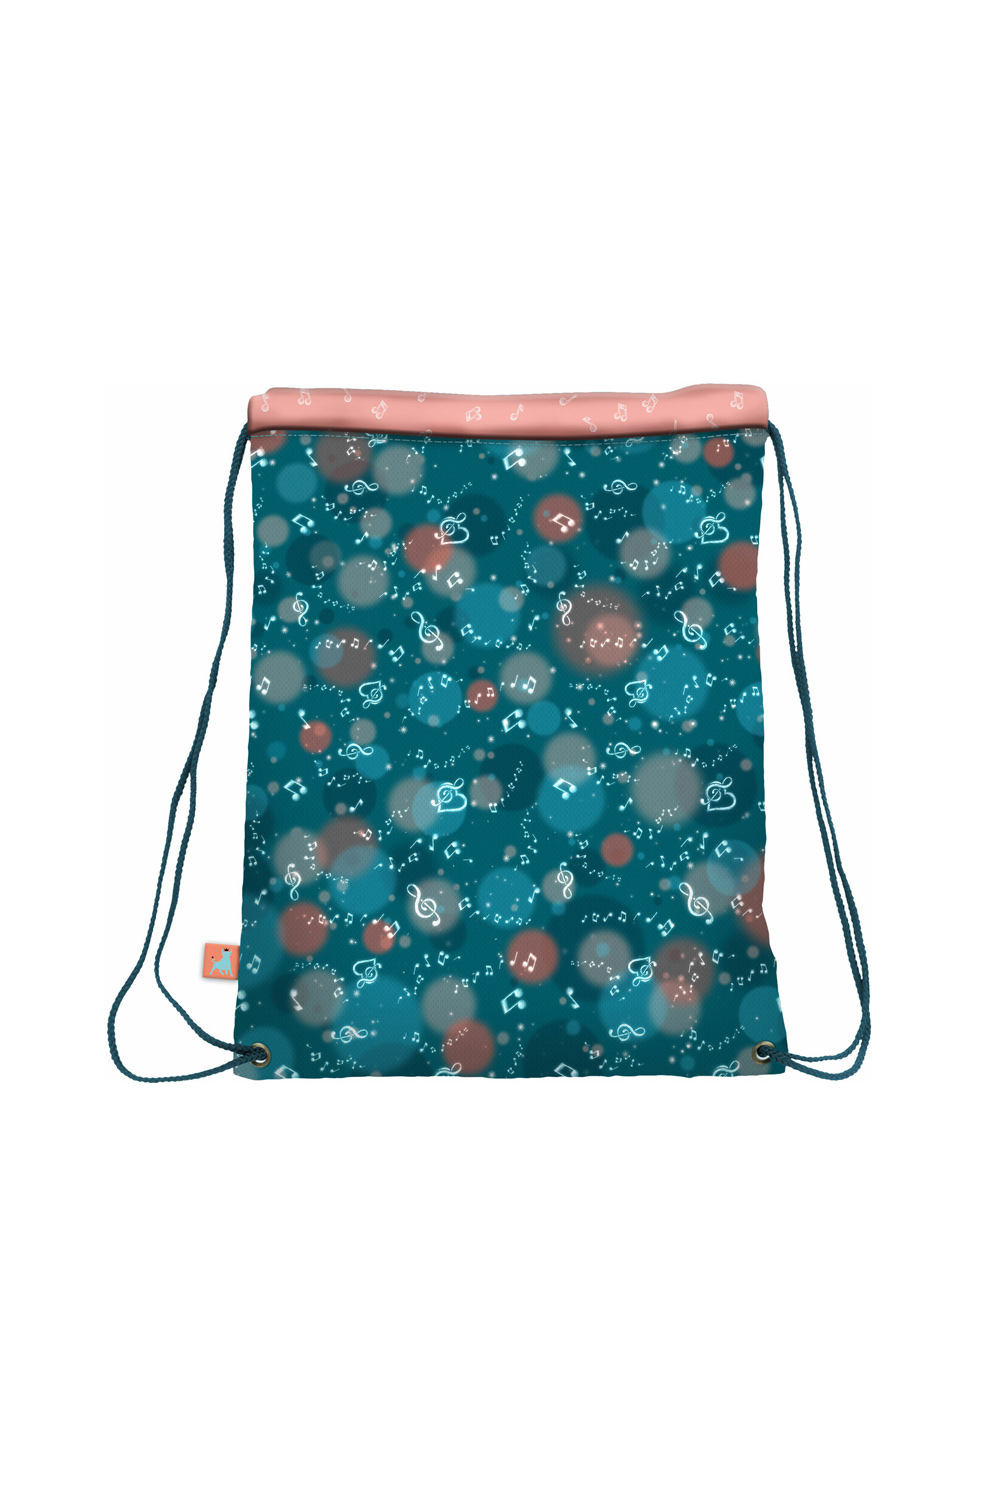 Santoro blue tighten drawstring bag Gorjuss Melodies This One´s For You